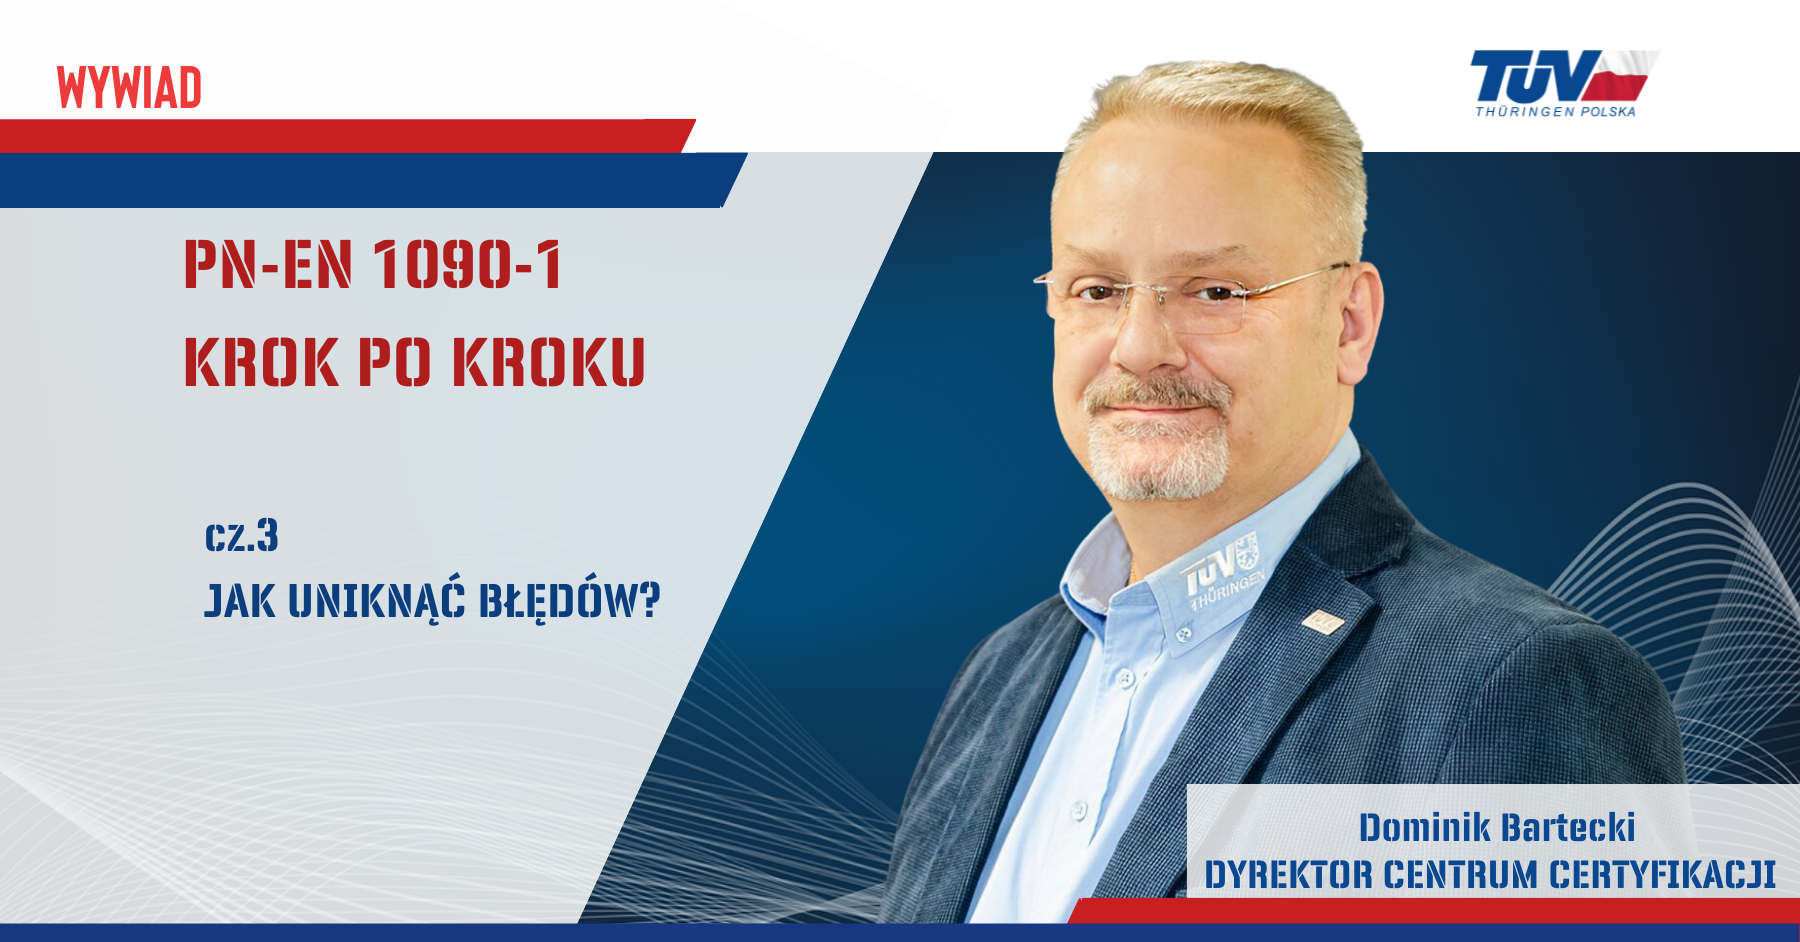 You are currently viewing PN EN 1090-1 Krok po kroku